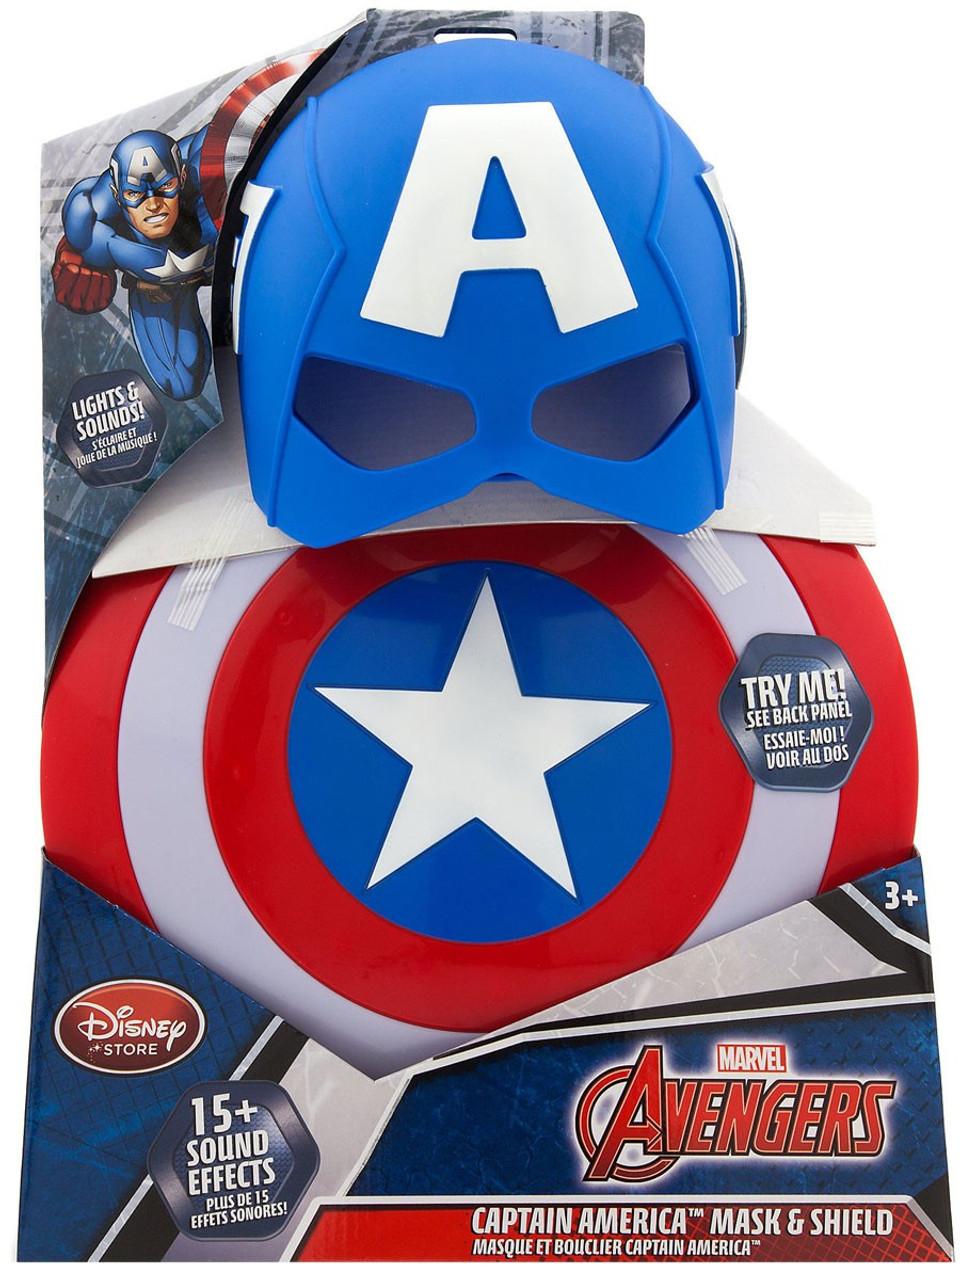 Disney Marvel Avengers Captain America Mask Shield Exclusive